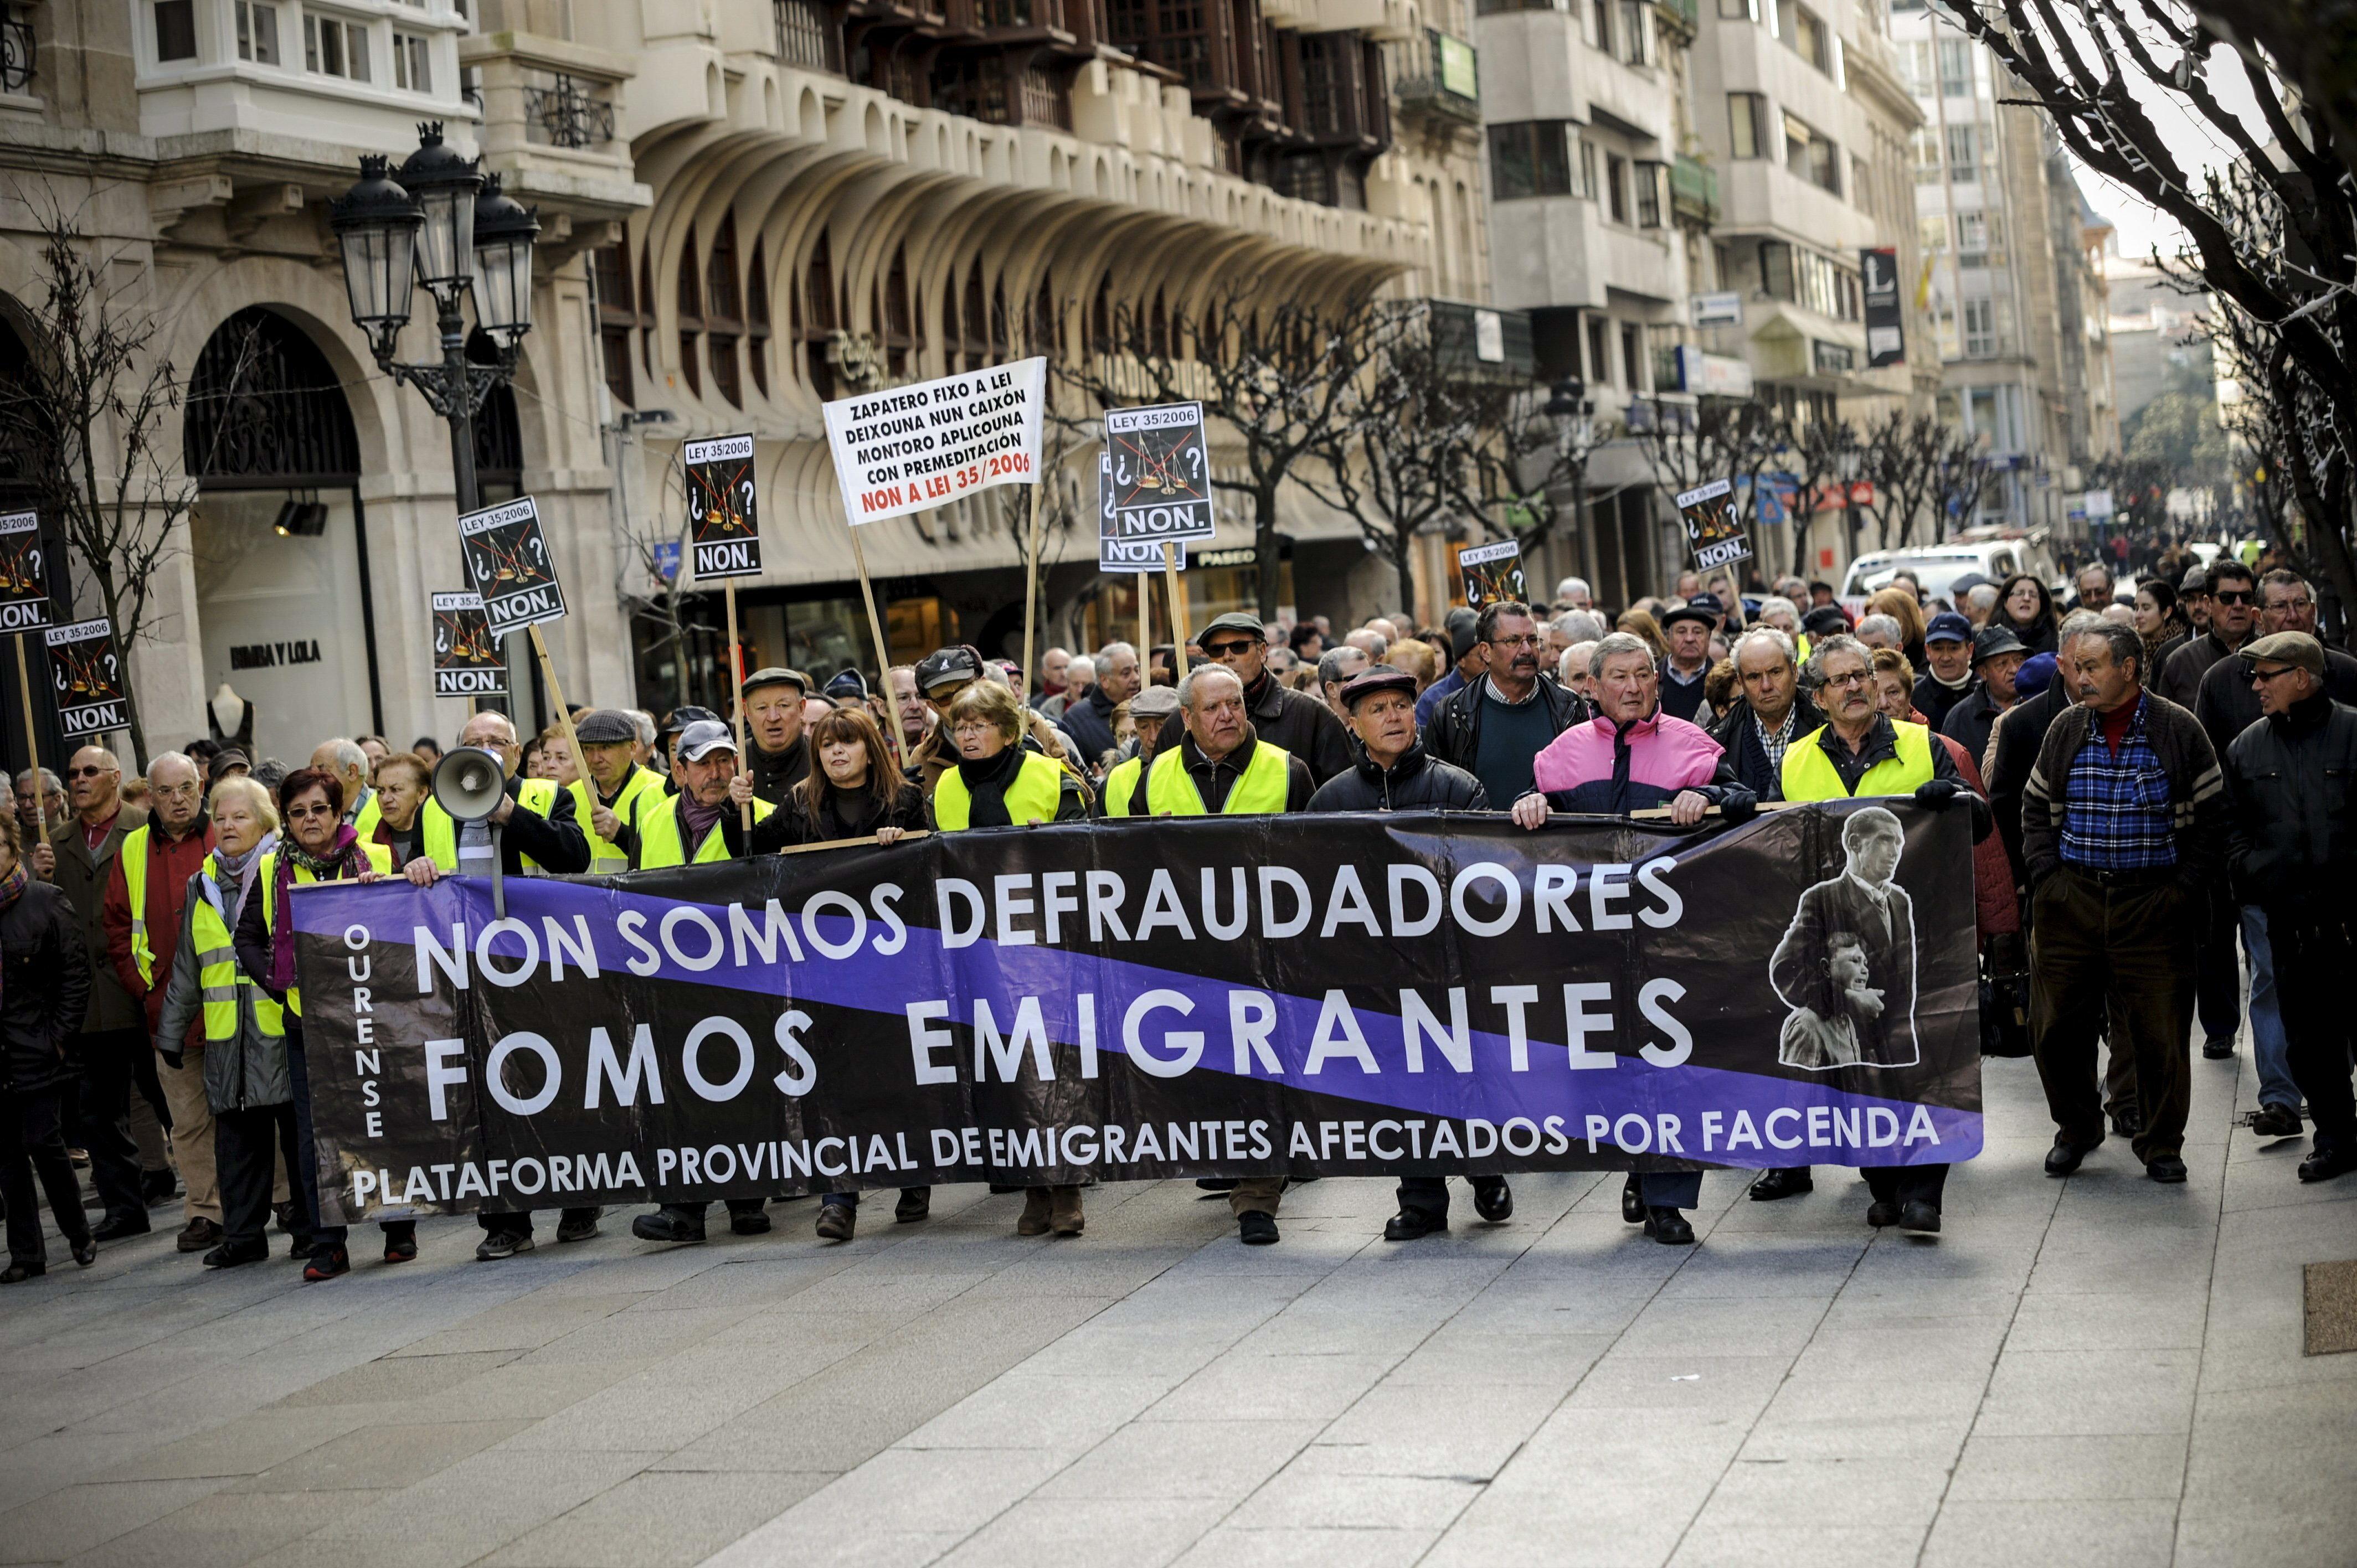 Emigrantes Retornados de Compostela, diante do edificio da AEAT, (Facenda de Salgueiriños) para continuar denunciando o expolio ao que son sometidos as e os emigrantes retornad@s.